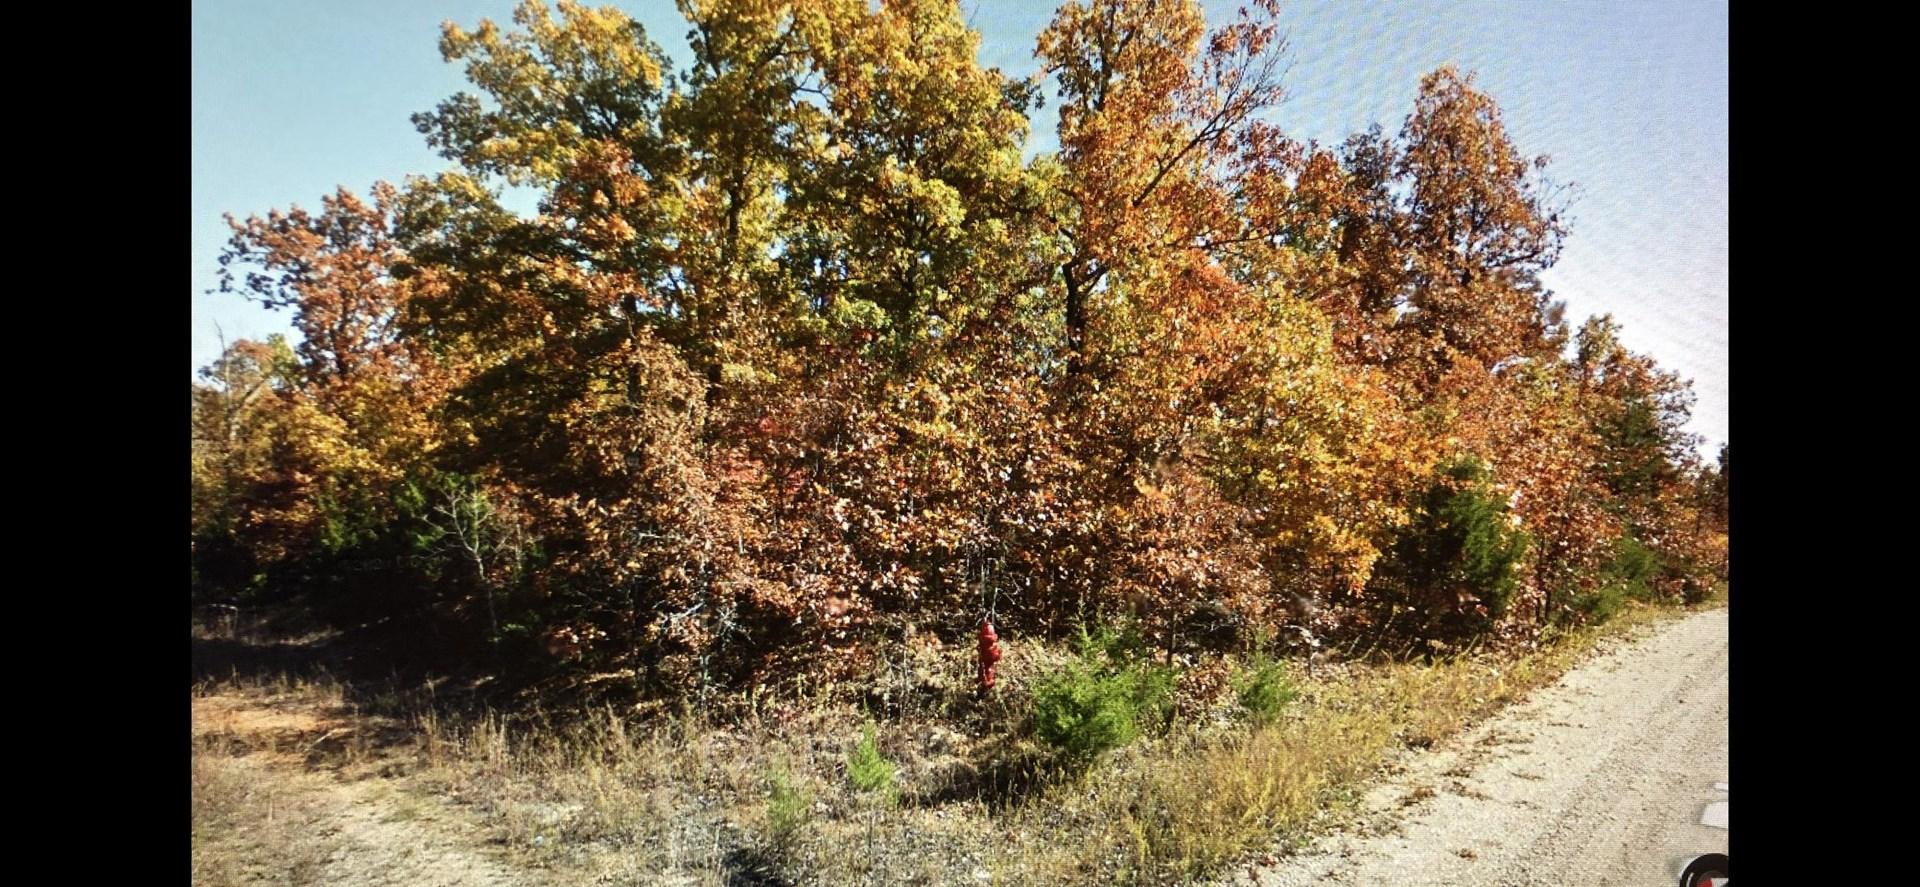 Land for sale in Horseshoe Bend, Arkansas